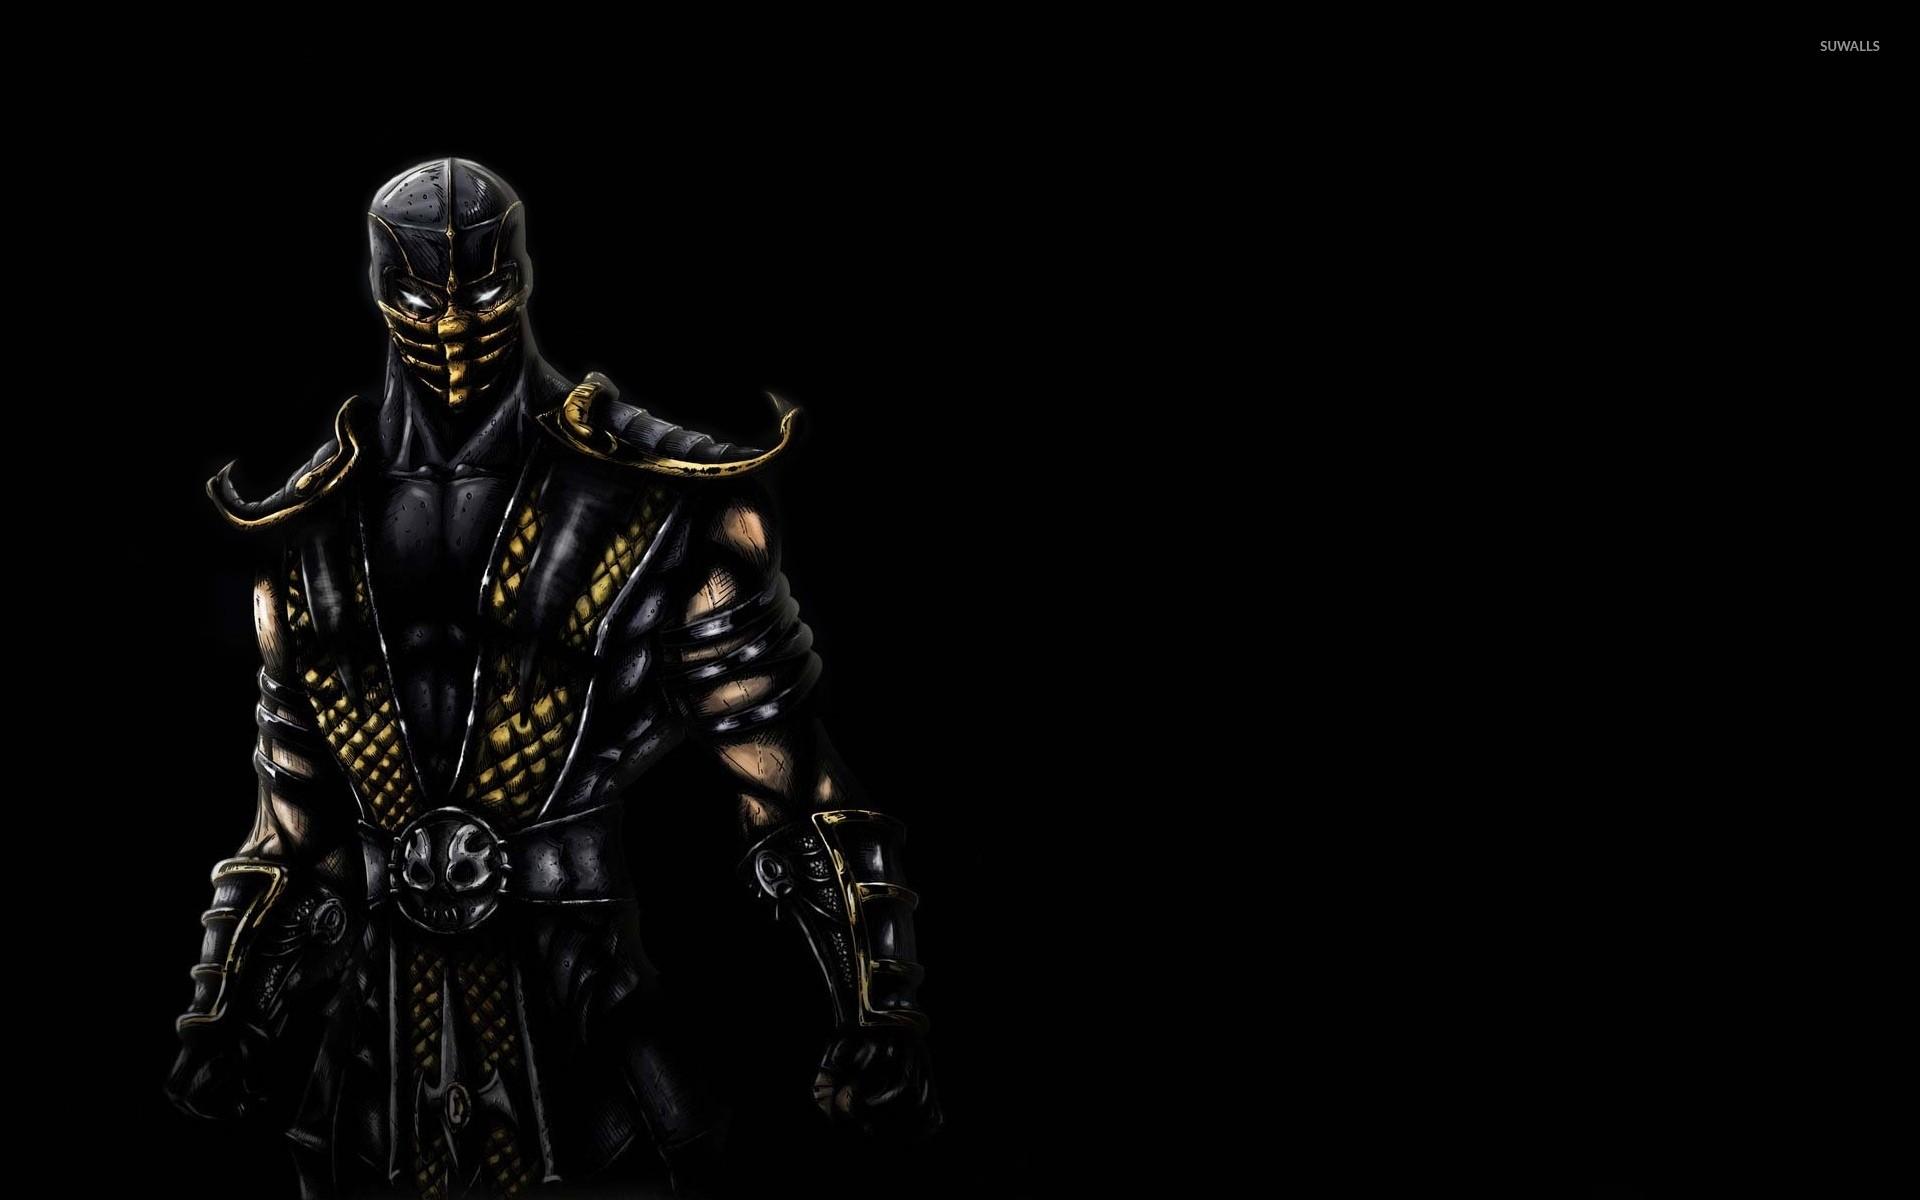 Scorpion – Mortal Kombat [2] wallpaper jpg